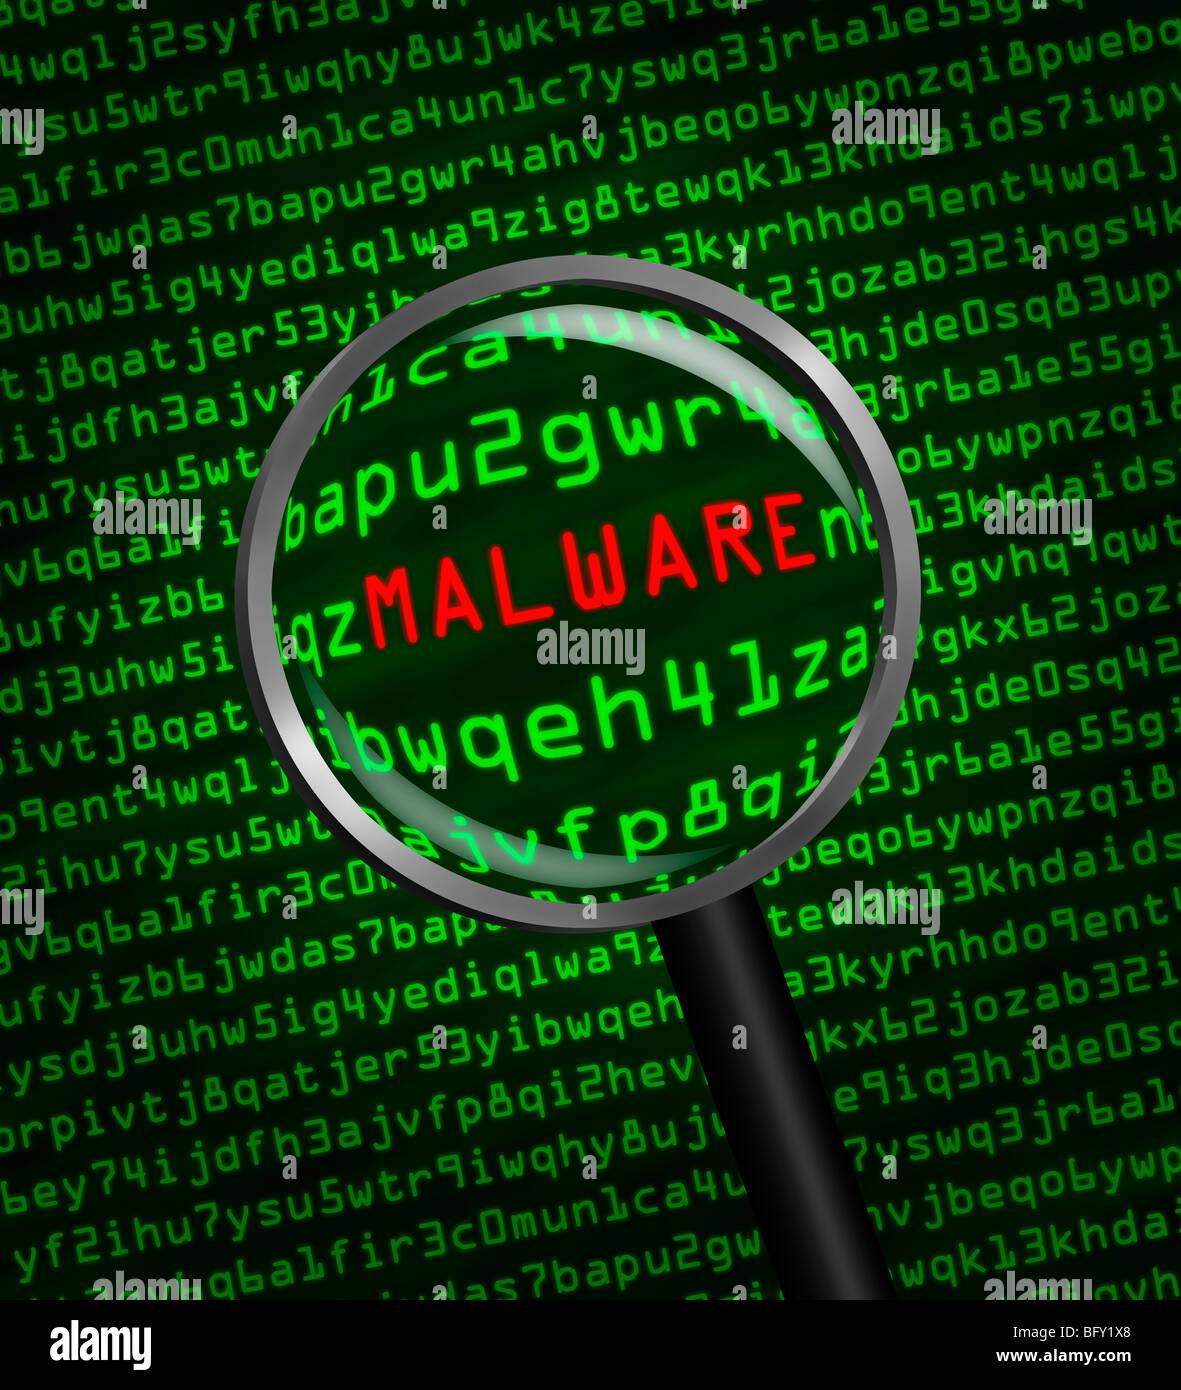 Lupe vergrößern Malware in Computer-Maschinen-code Stockbild